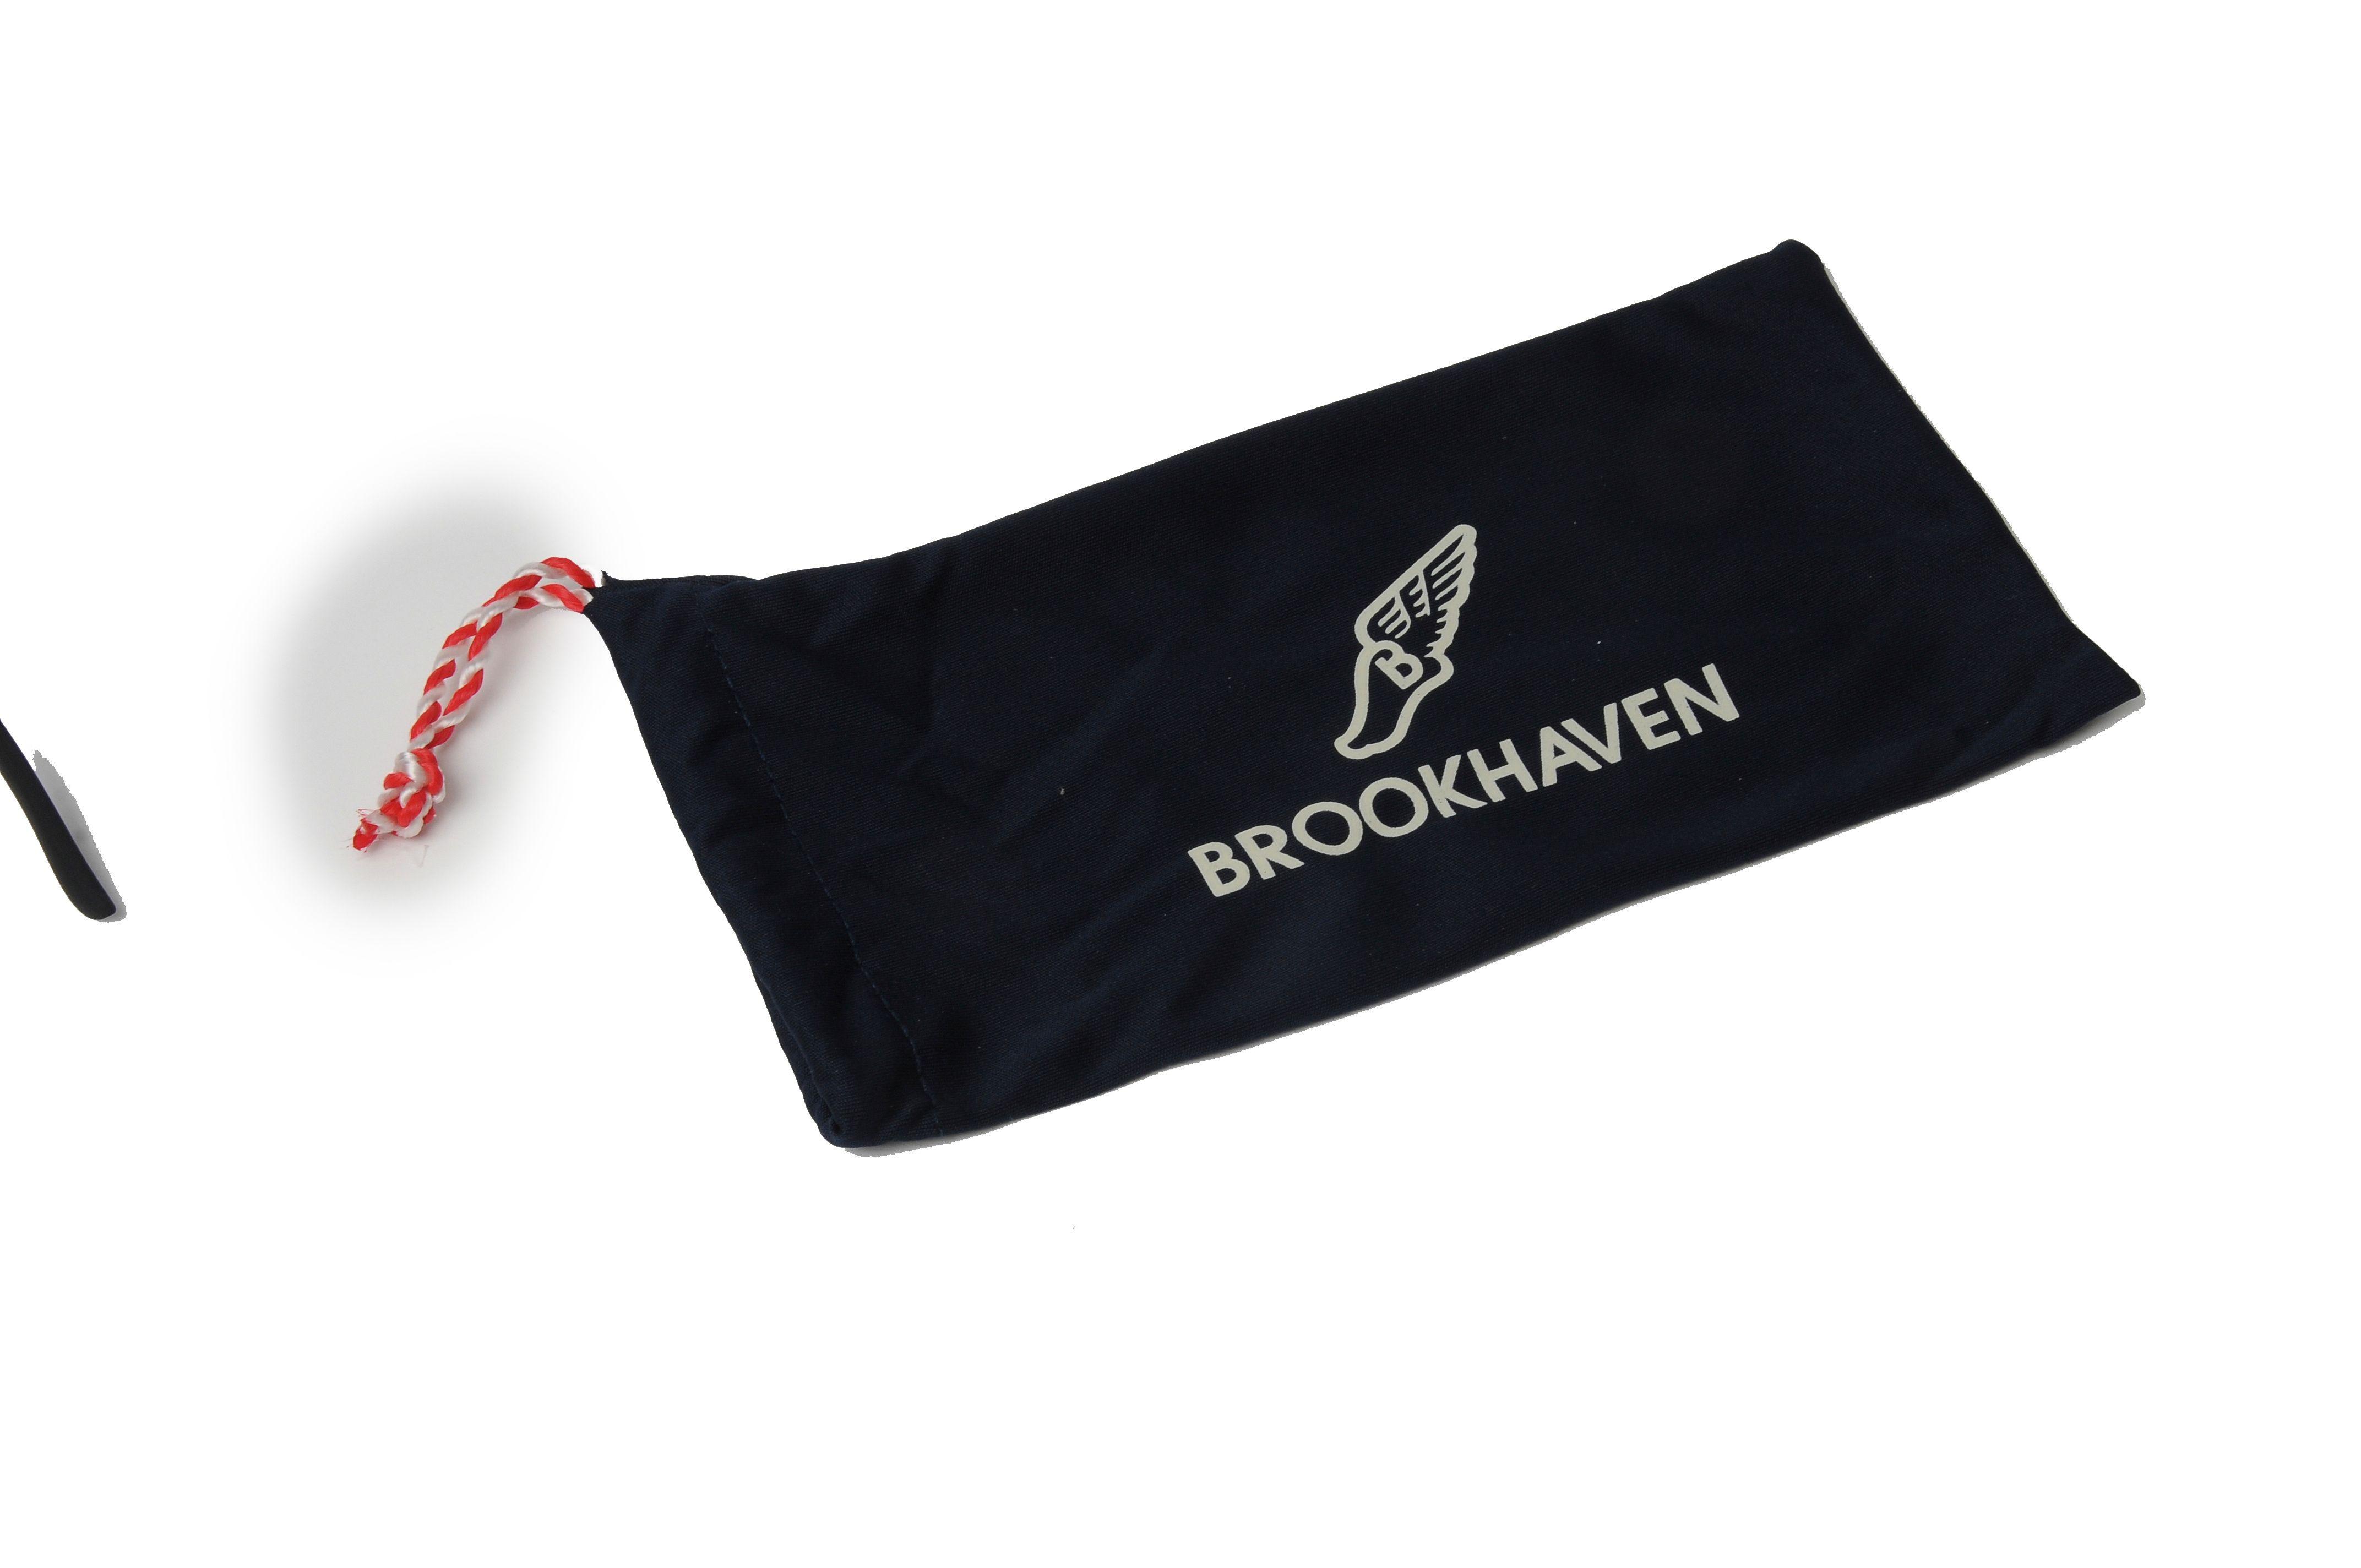 Brookhaven Thomas Sunglasses